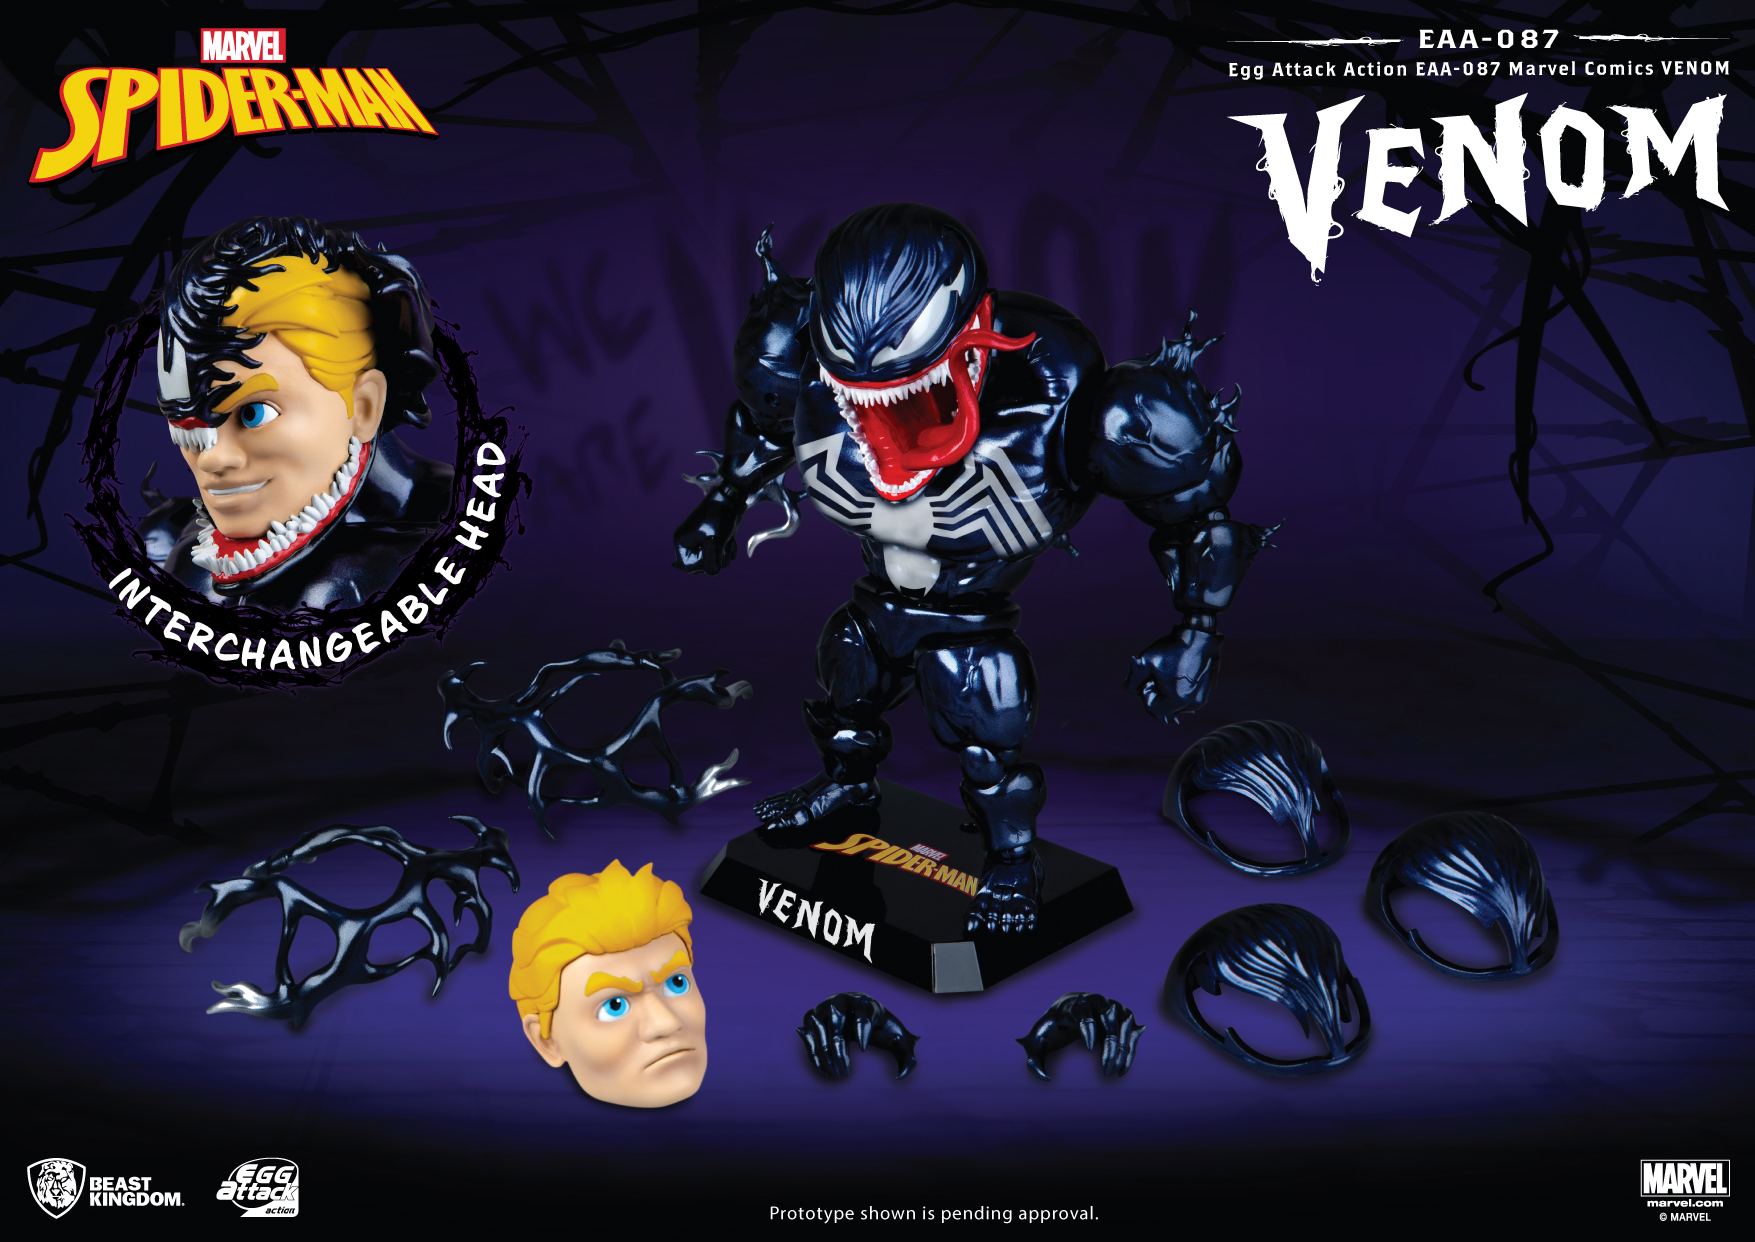 We are Eggom: Beast Kingdom bring an exclusive Venom Egg